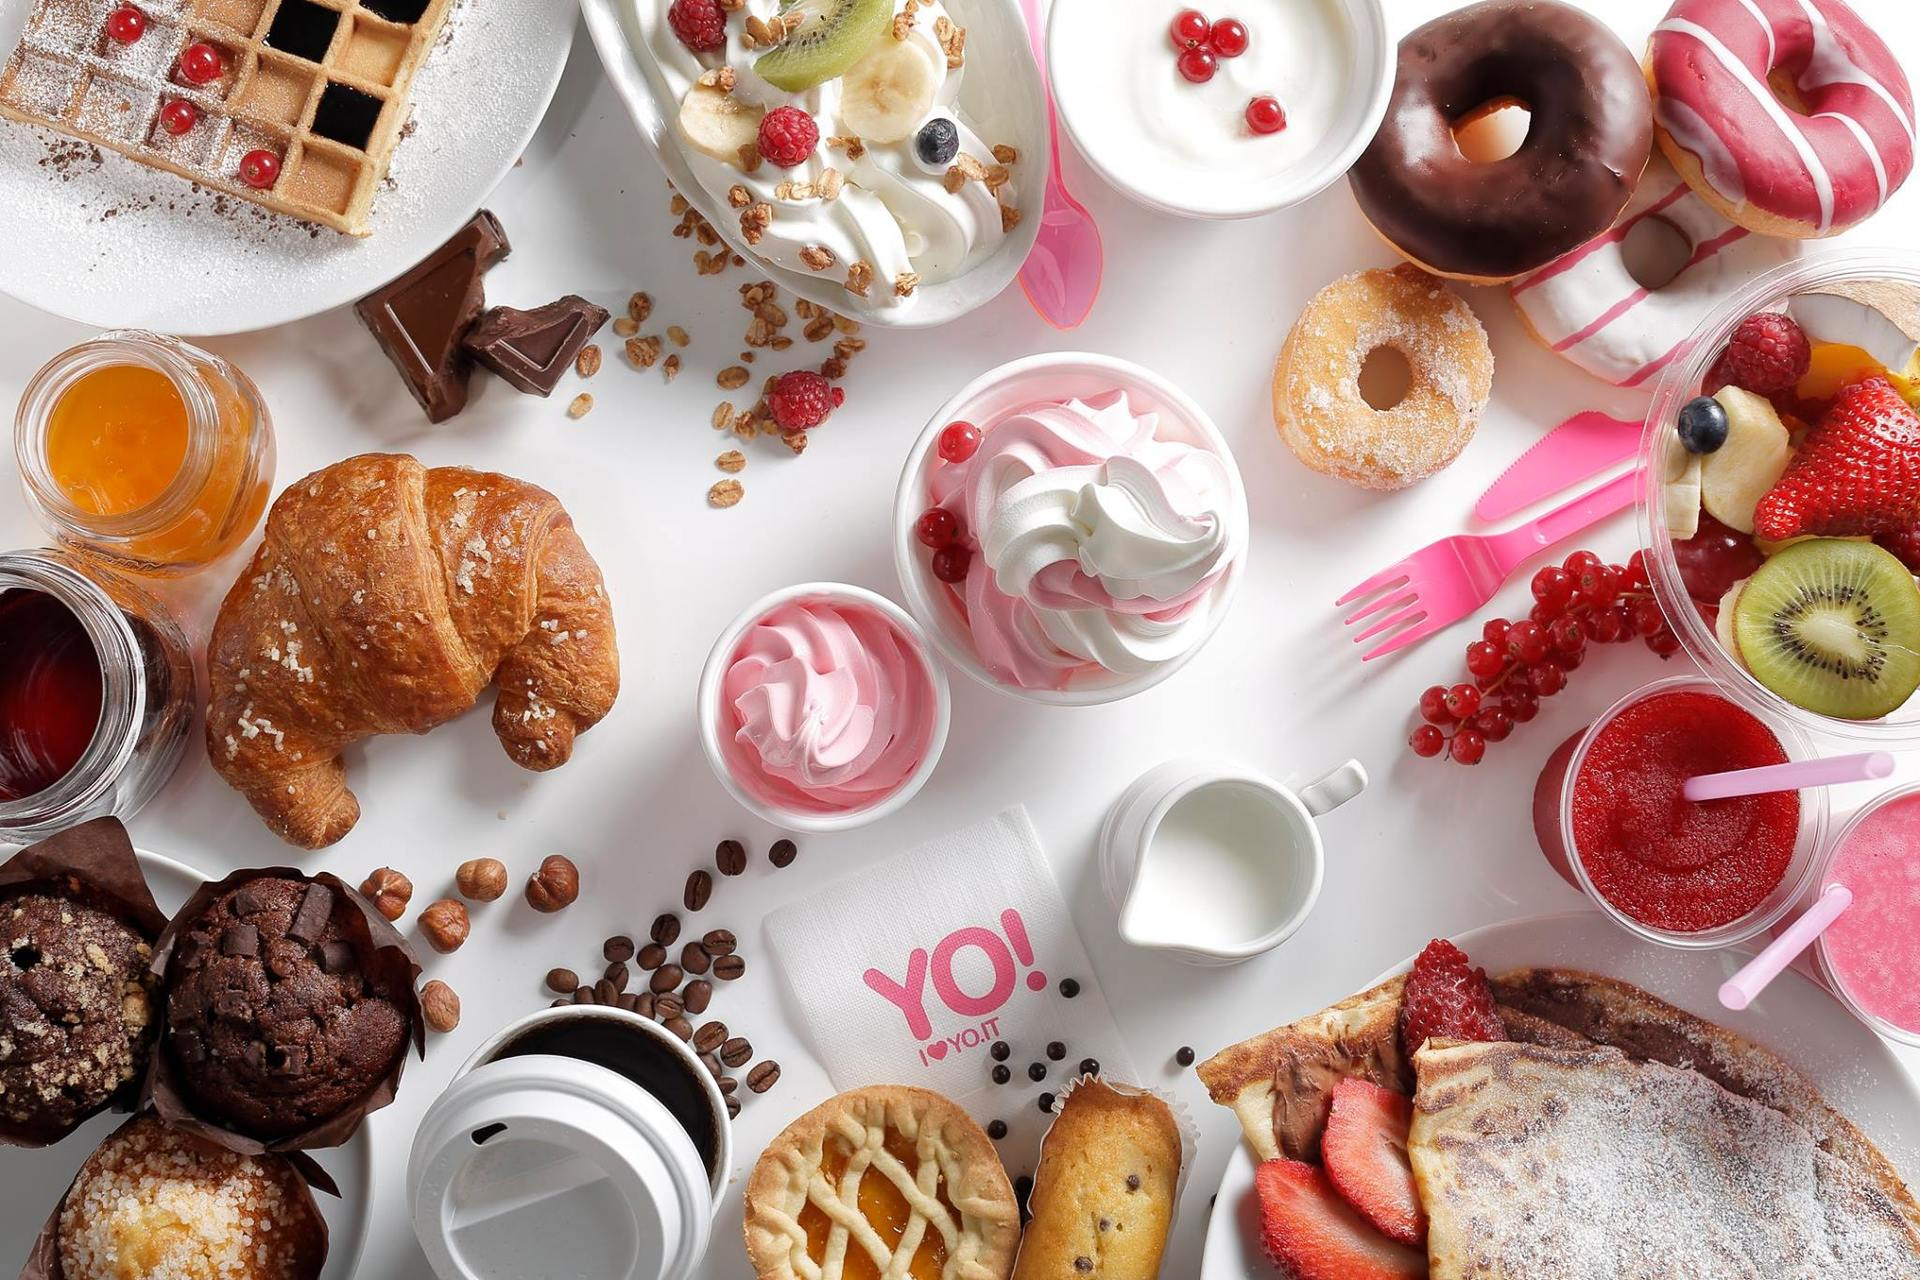 diversi tipi di dolce